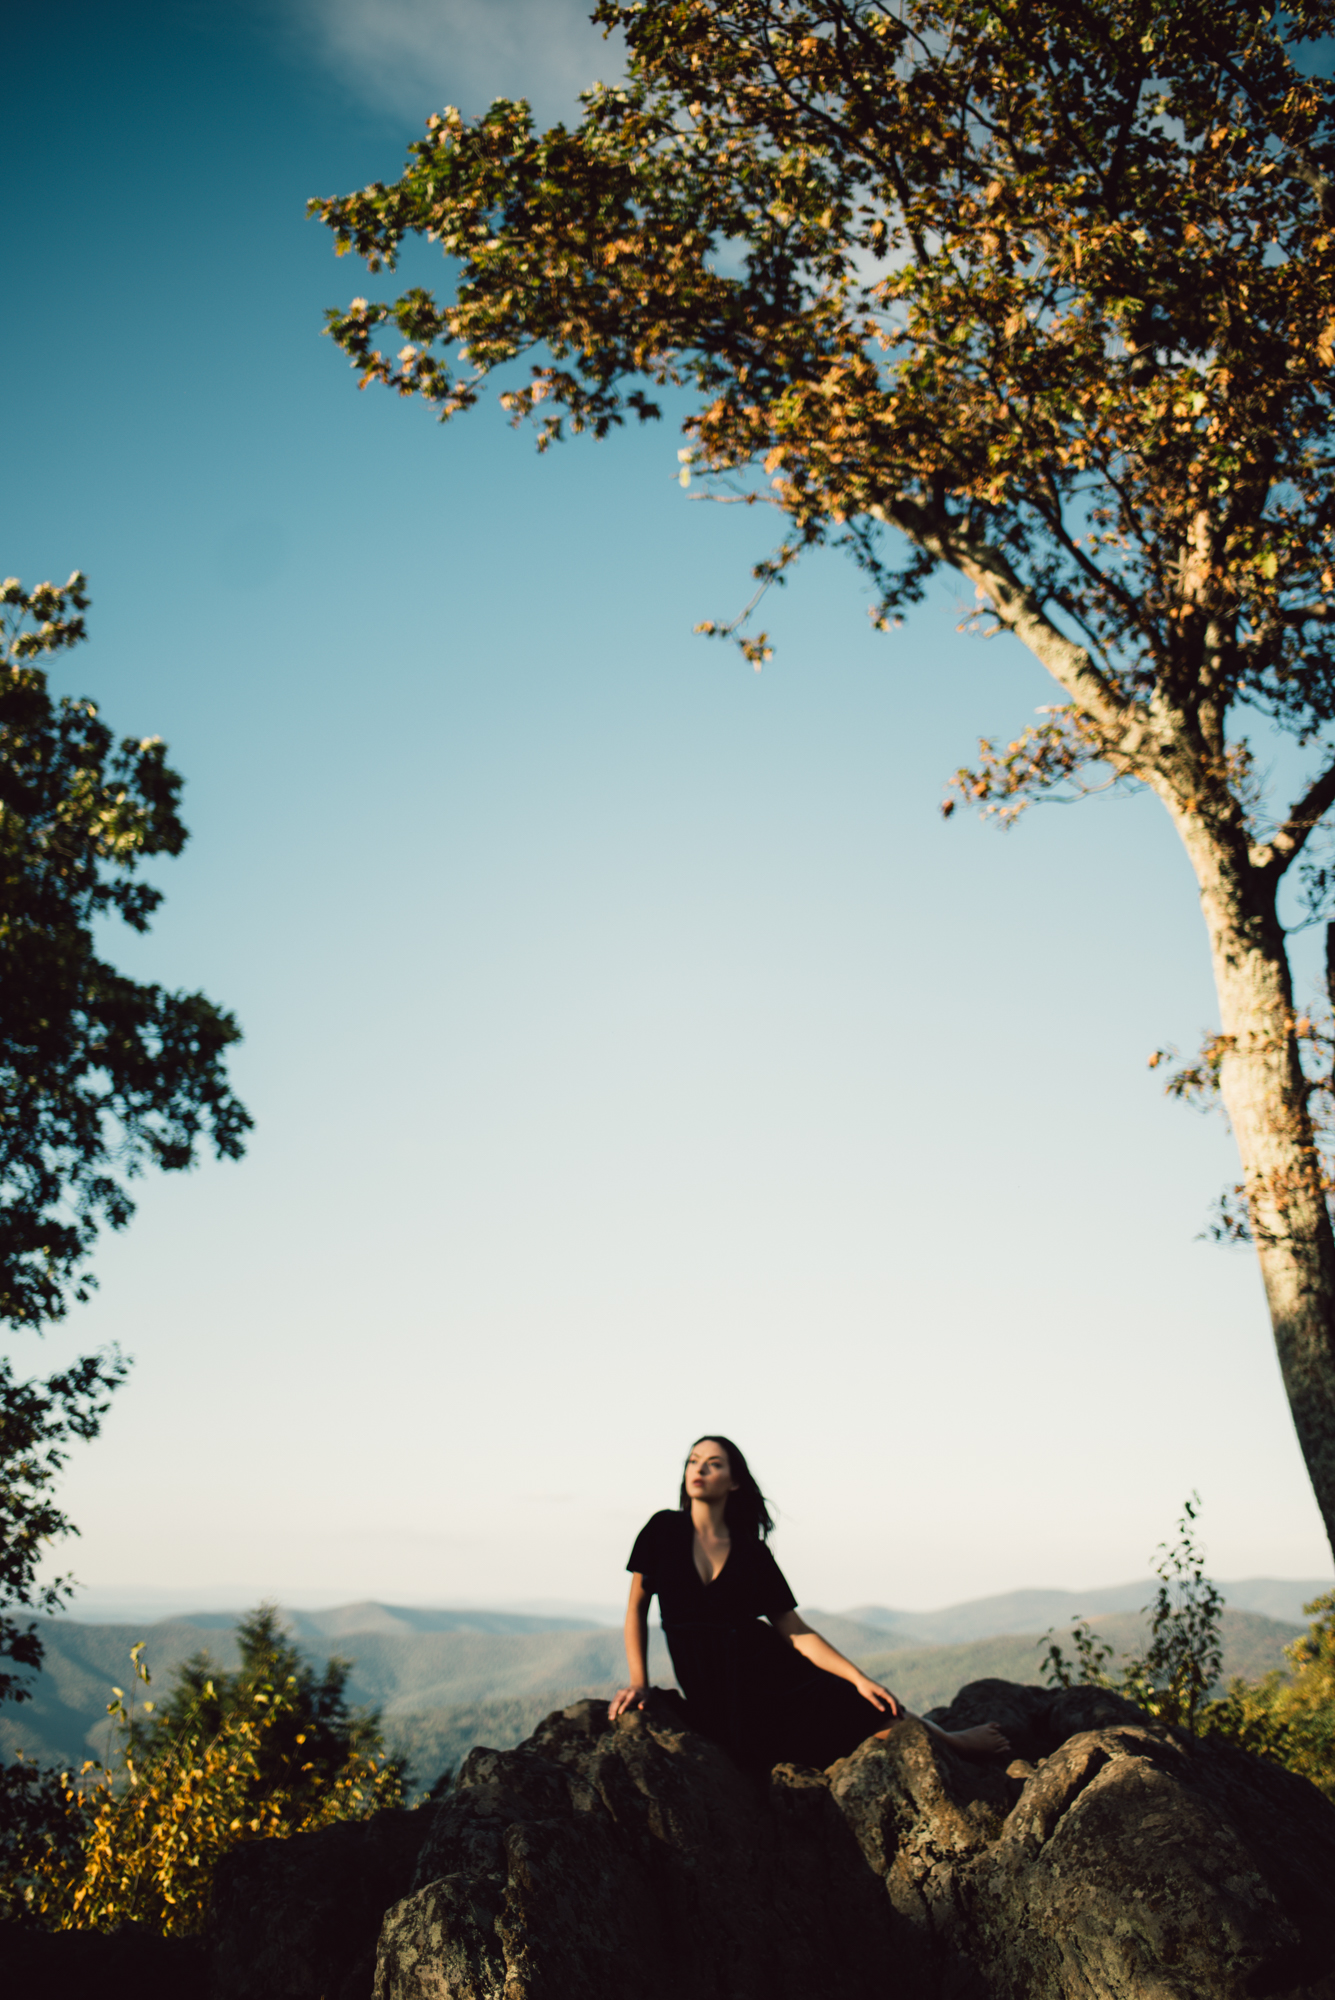 Megan_Shenandoah_National_Park_Windy_Romantic_Portraits_67.JPG